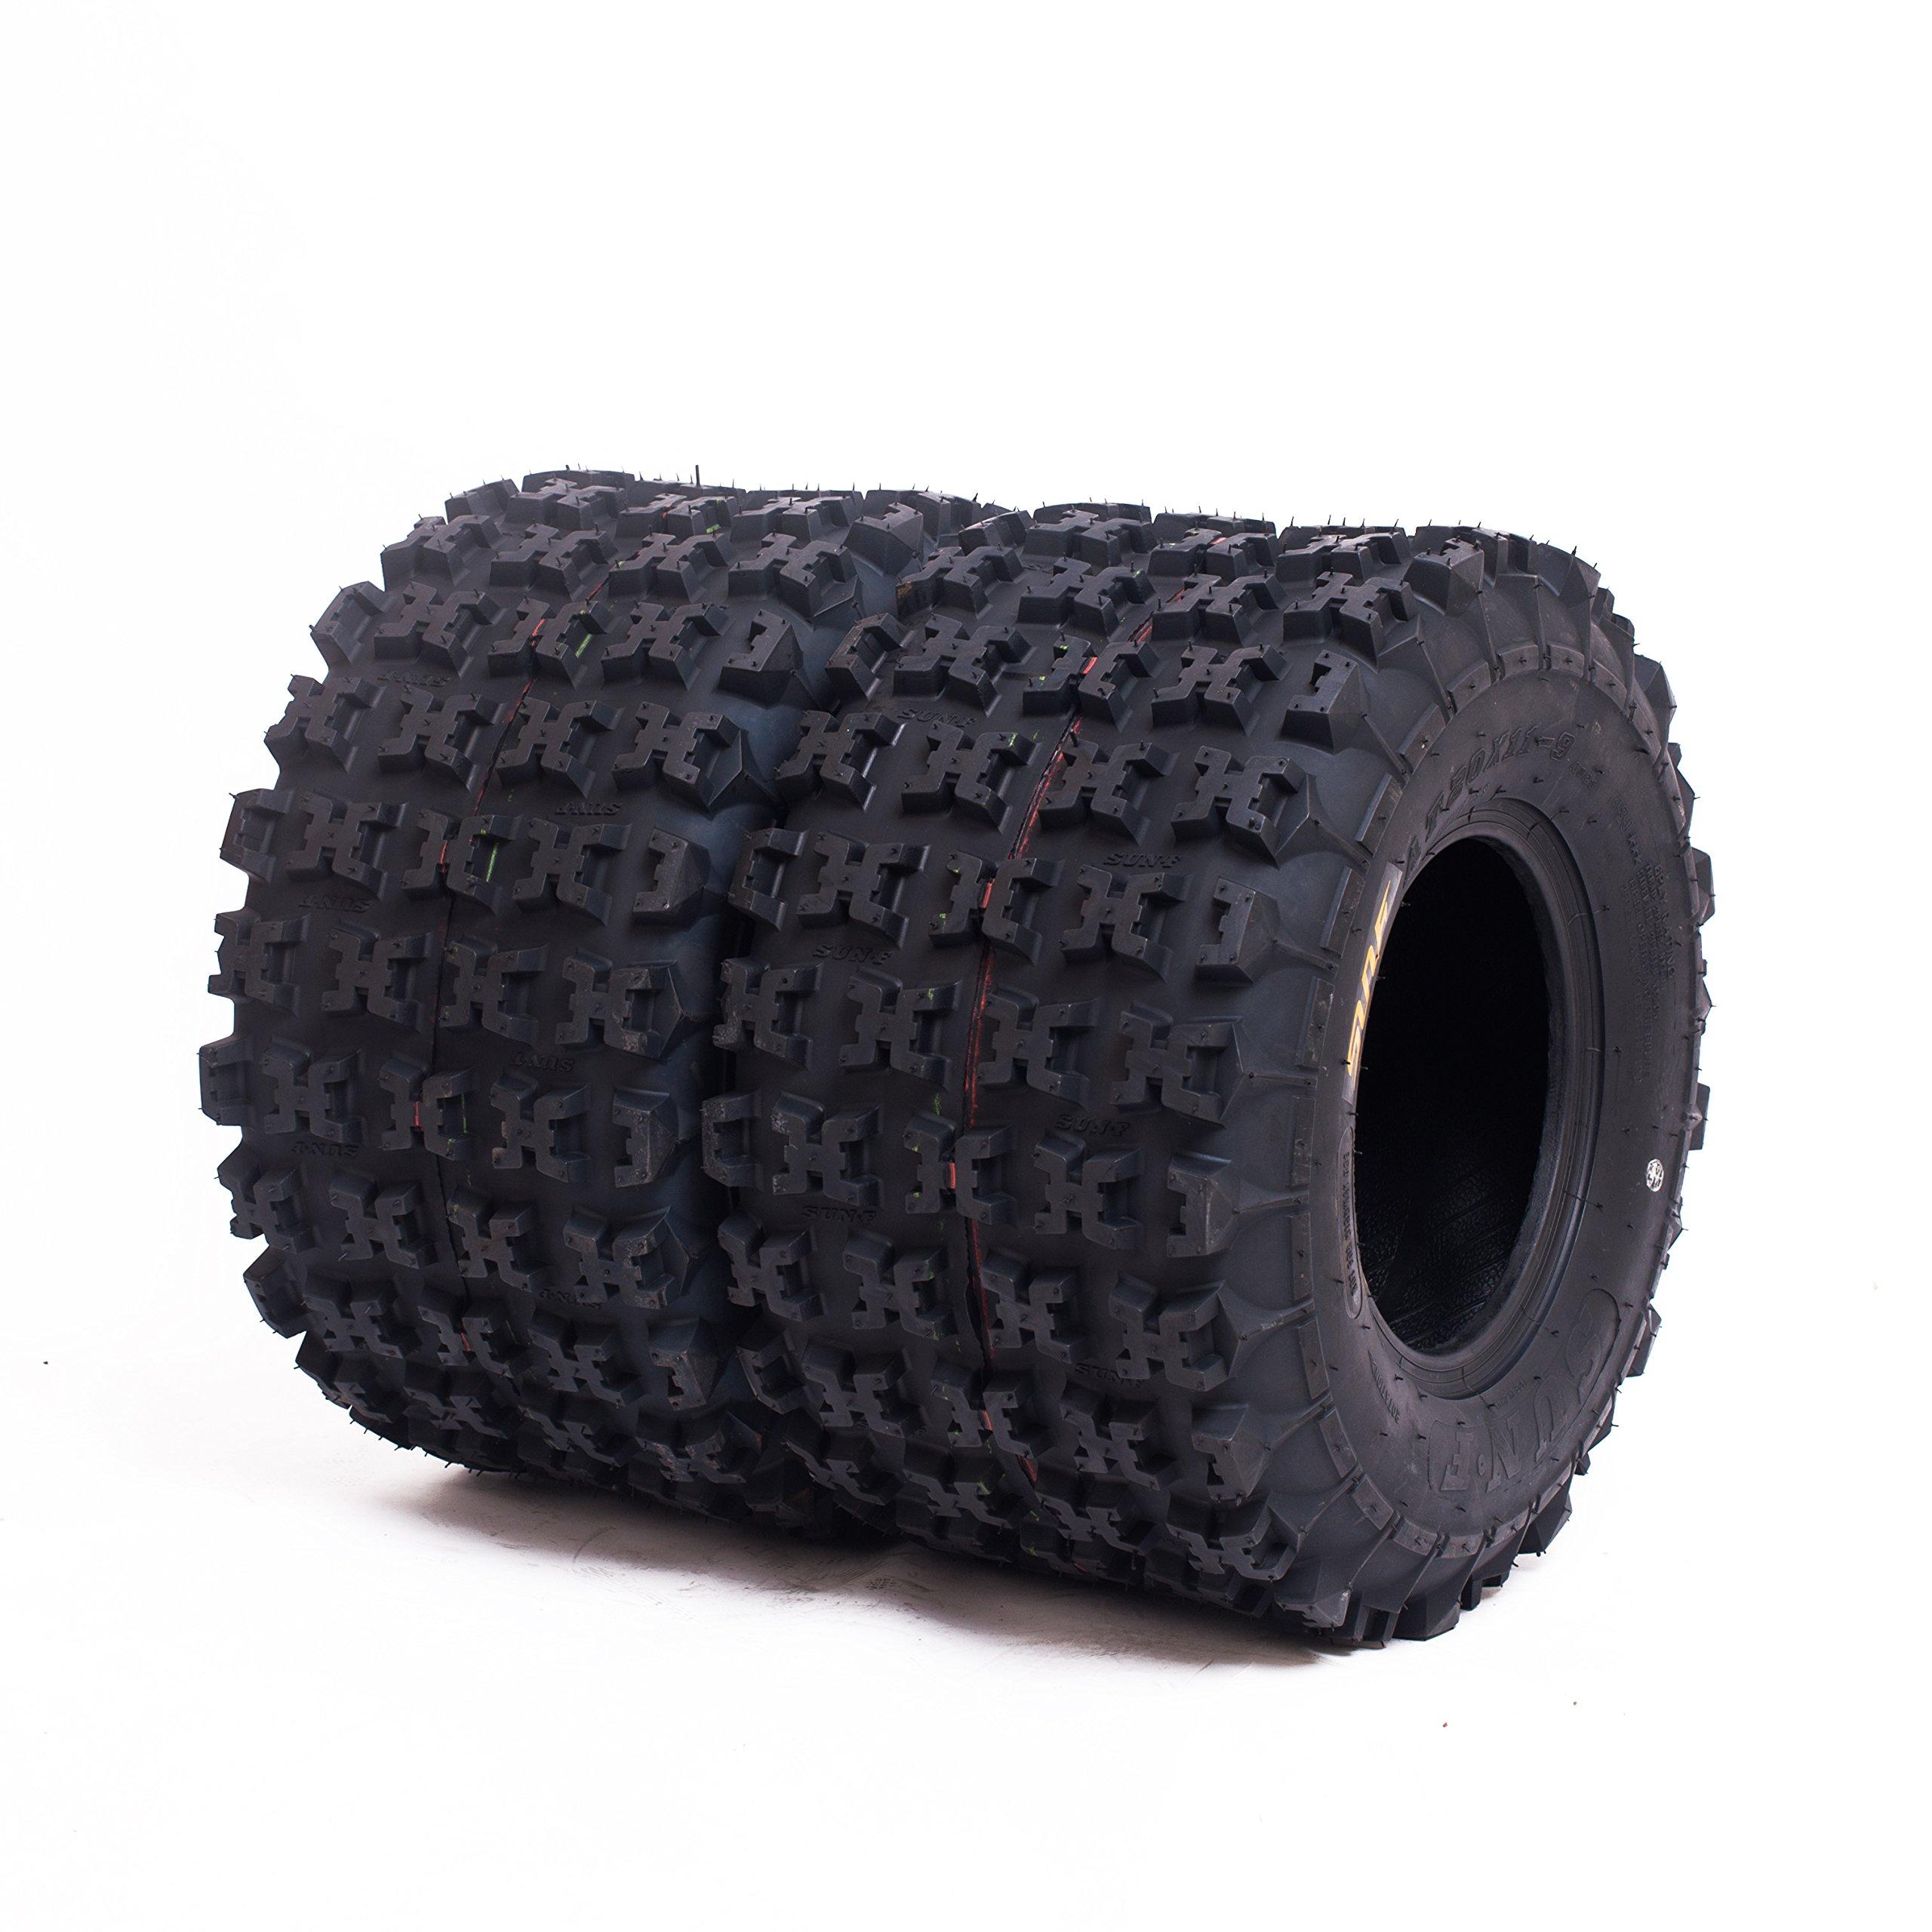 Set of 2 SunF A027 ATV Tires 20x11-8 Rear, 6 Ply